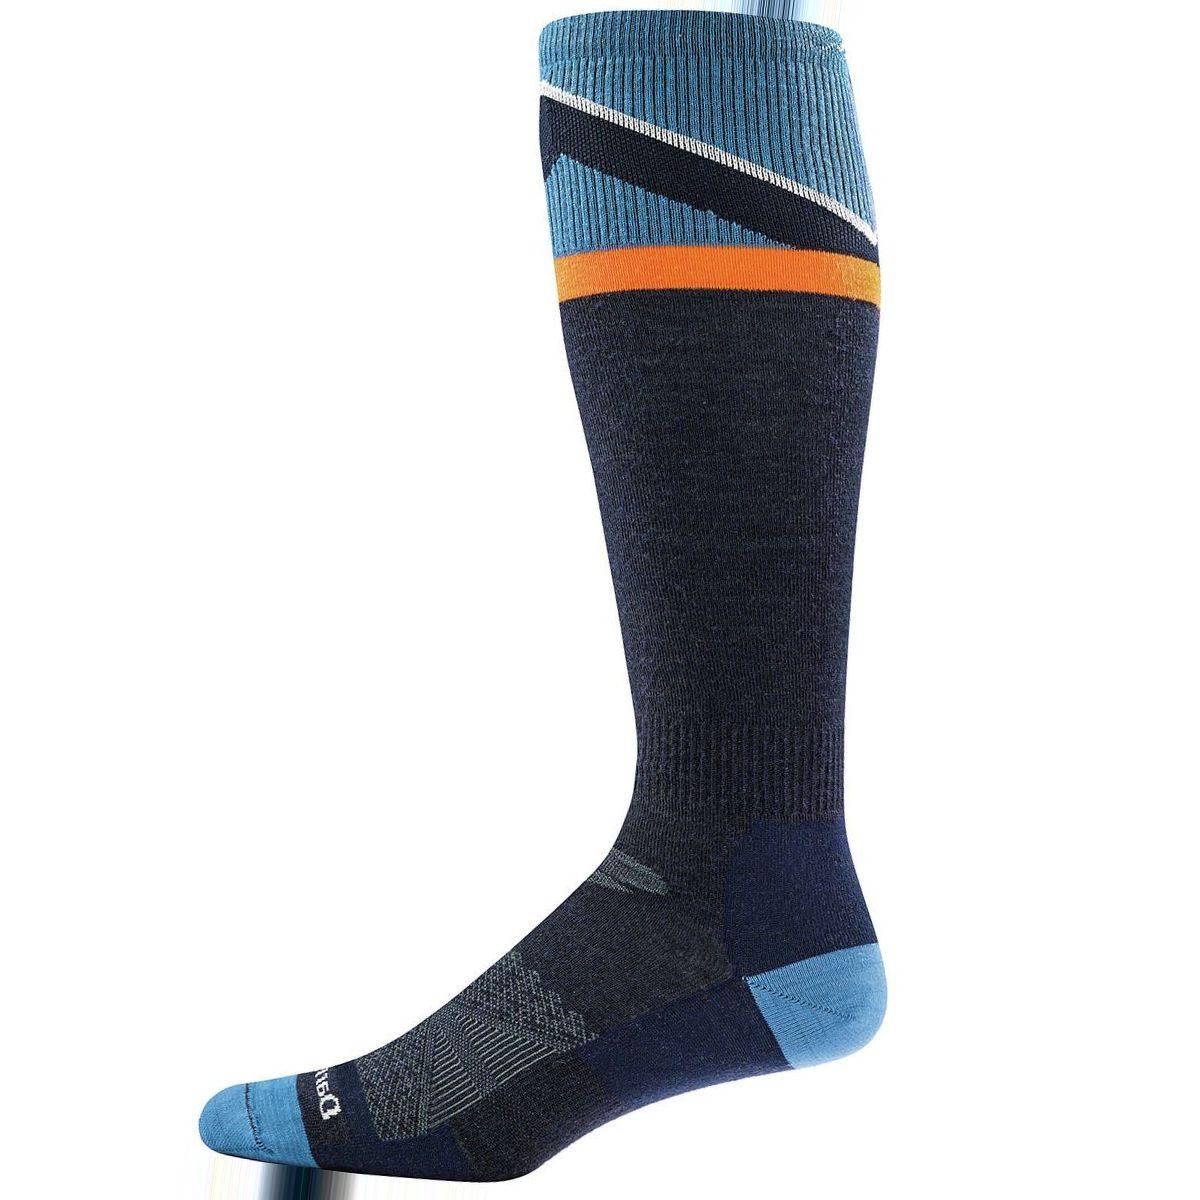 Darn Tough Mountain Top OTC Light Sock - Men's